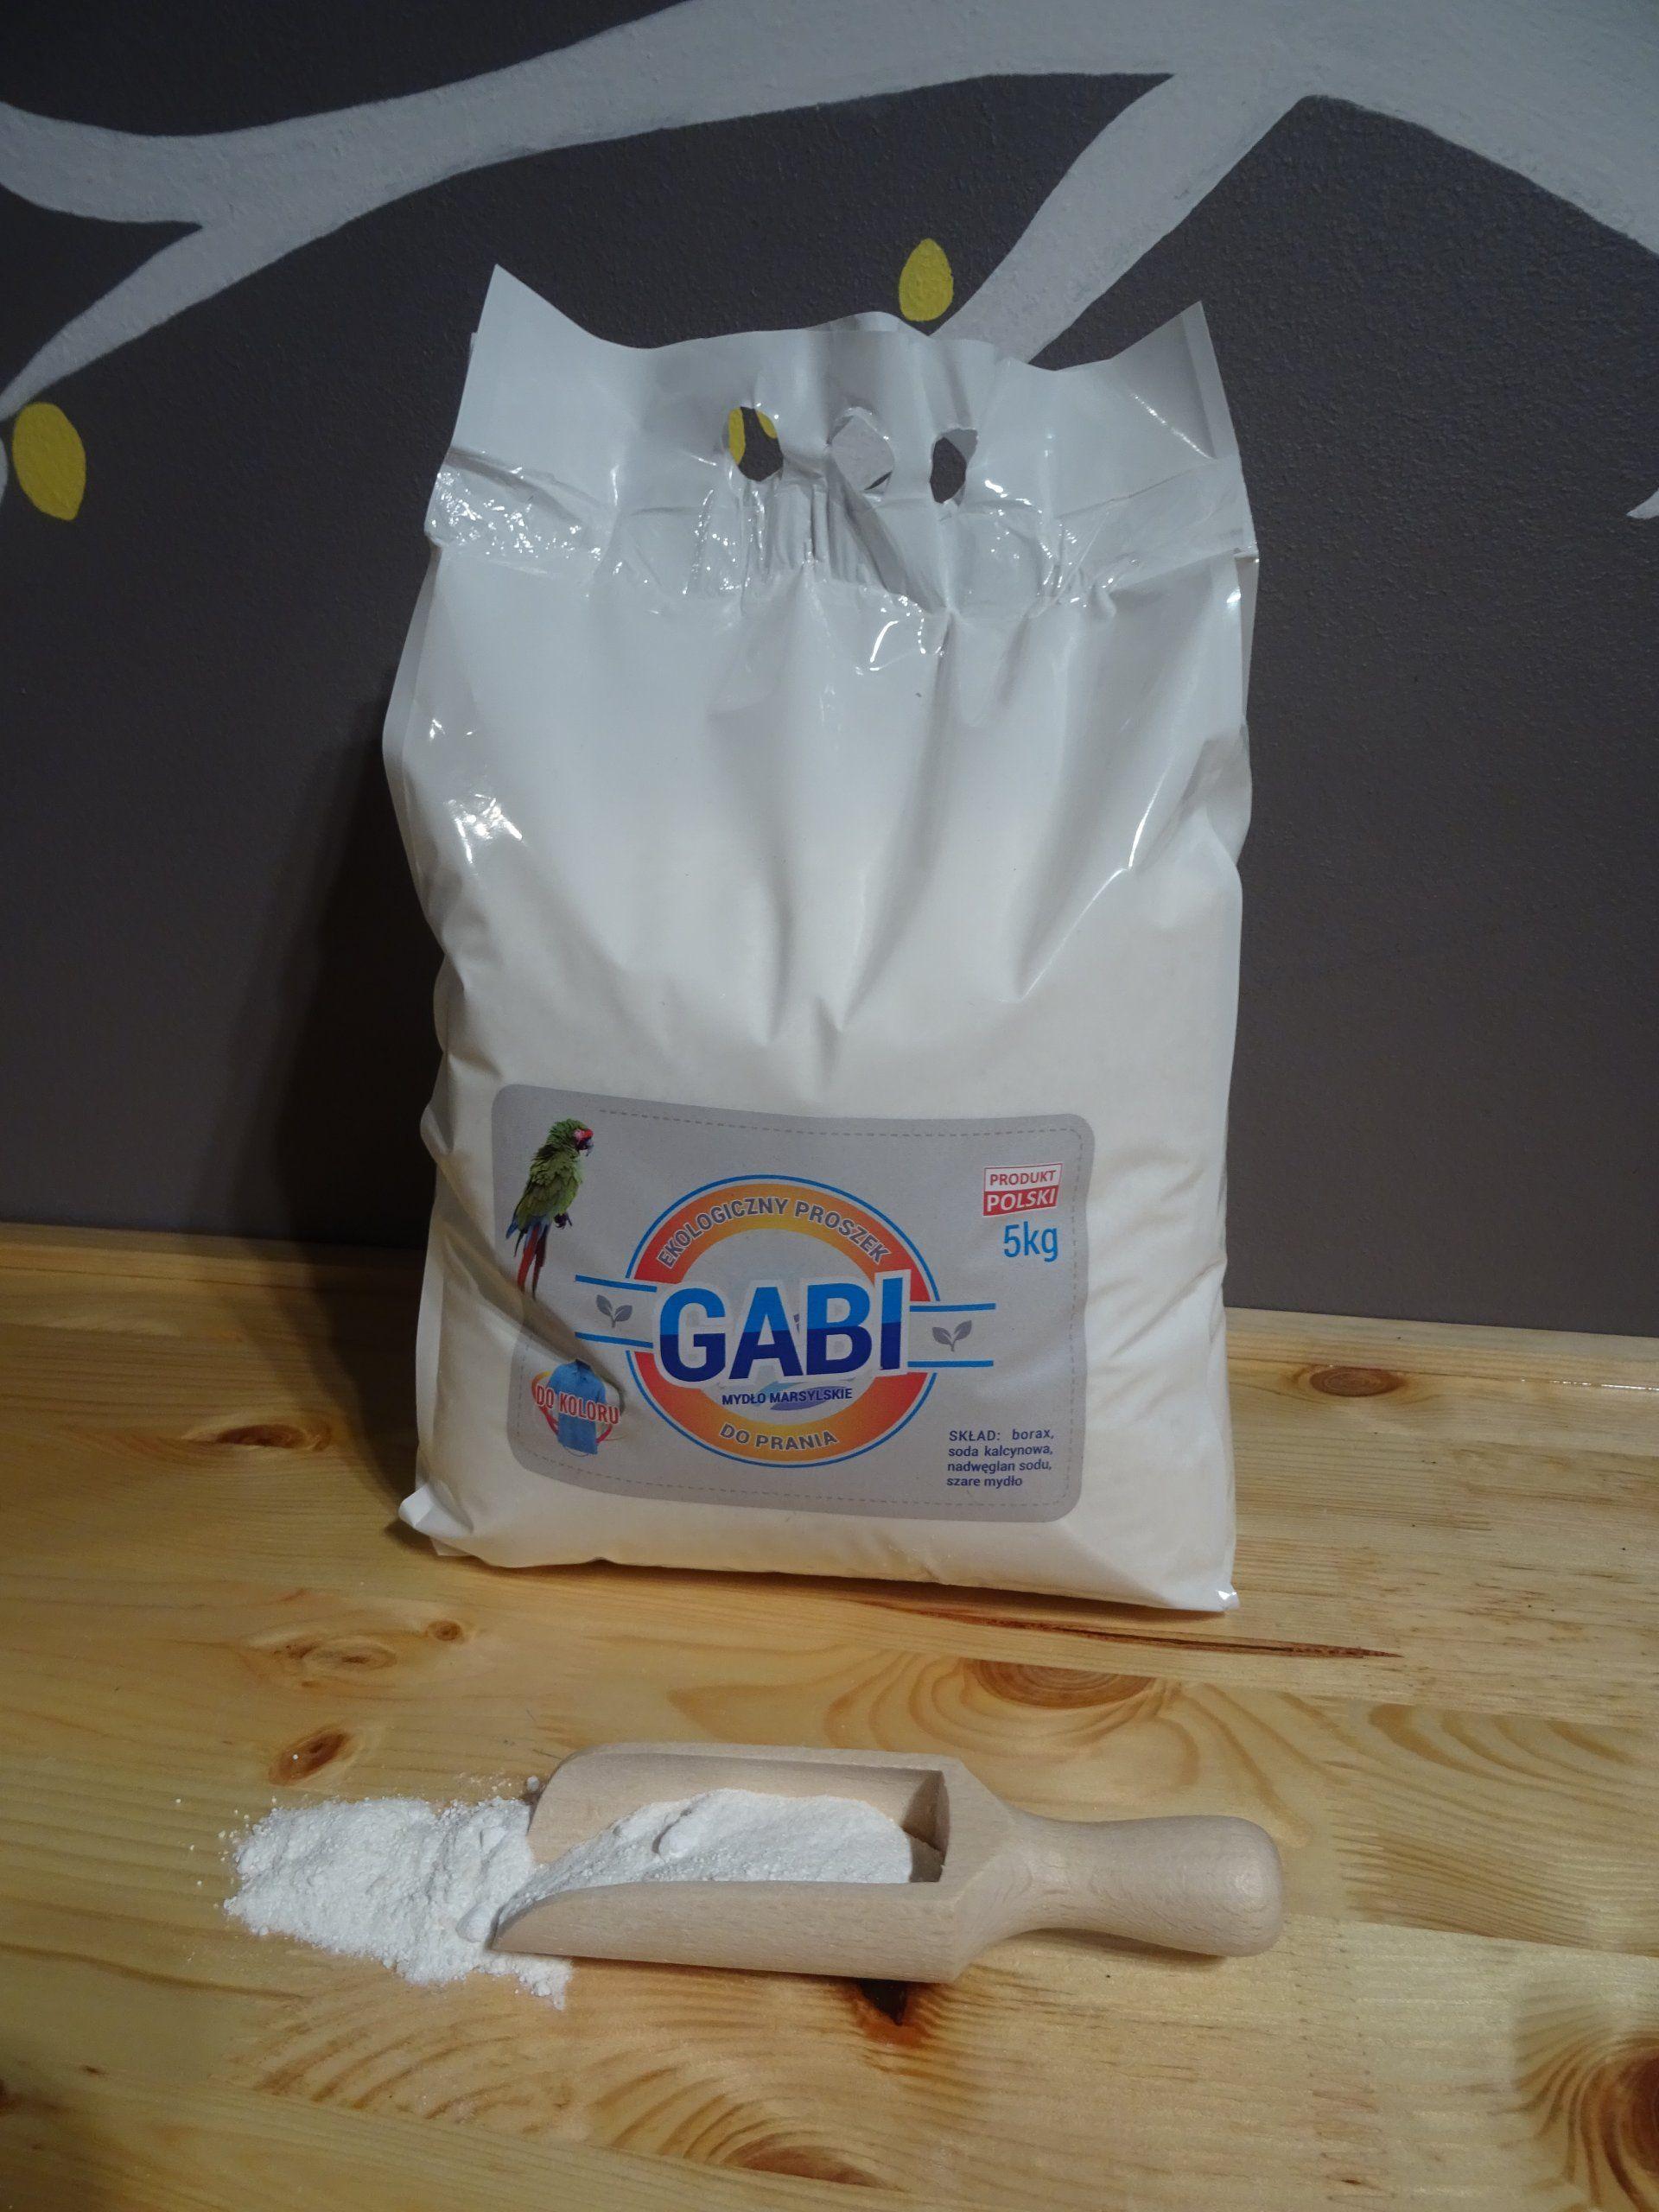 Eko Proszek Do Prania Gabi Do Koloru 3kg Worek 7047147392 Oficjalne Archiwum Allegro Paper Shopping Bag Laundry Bag Decor